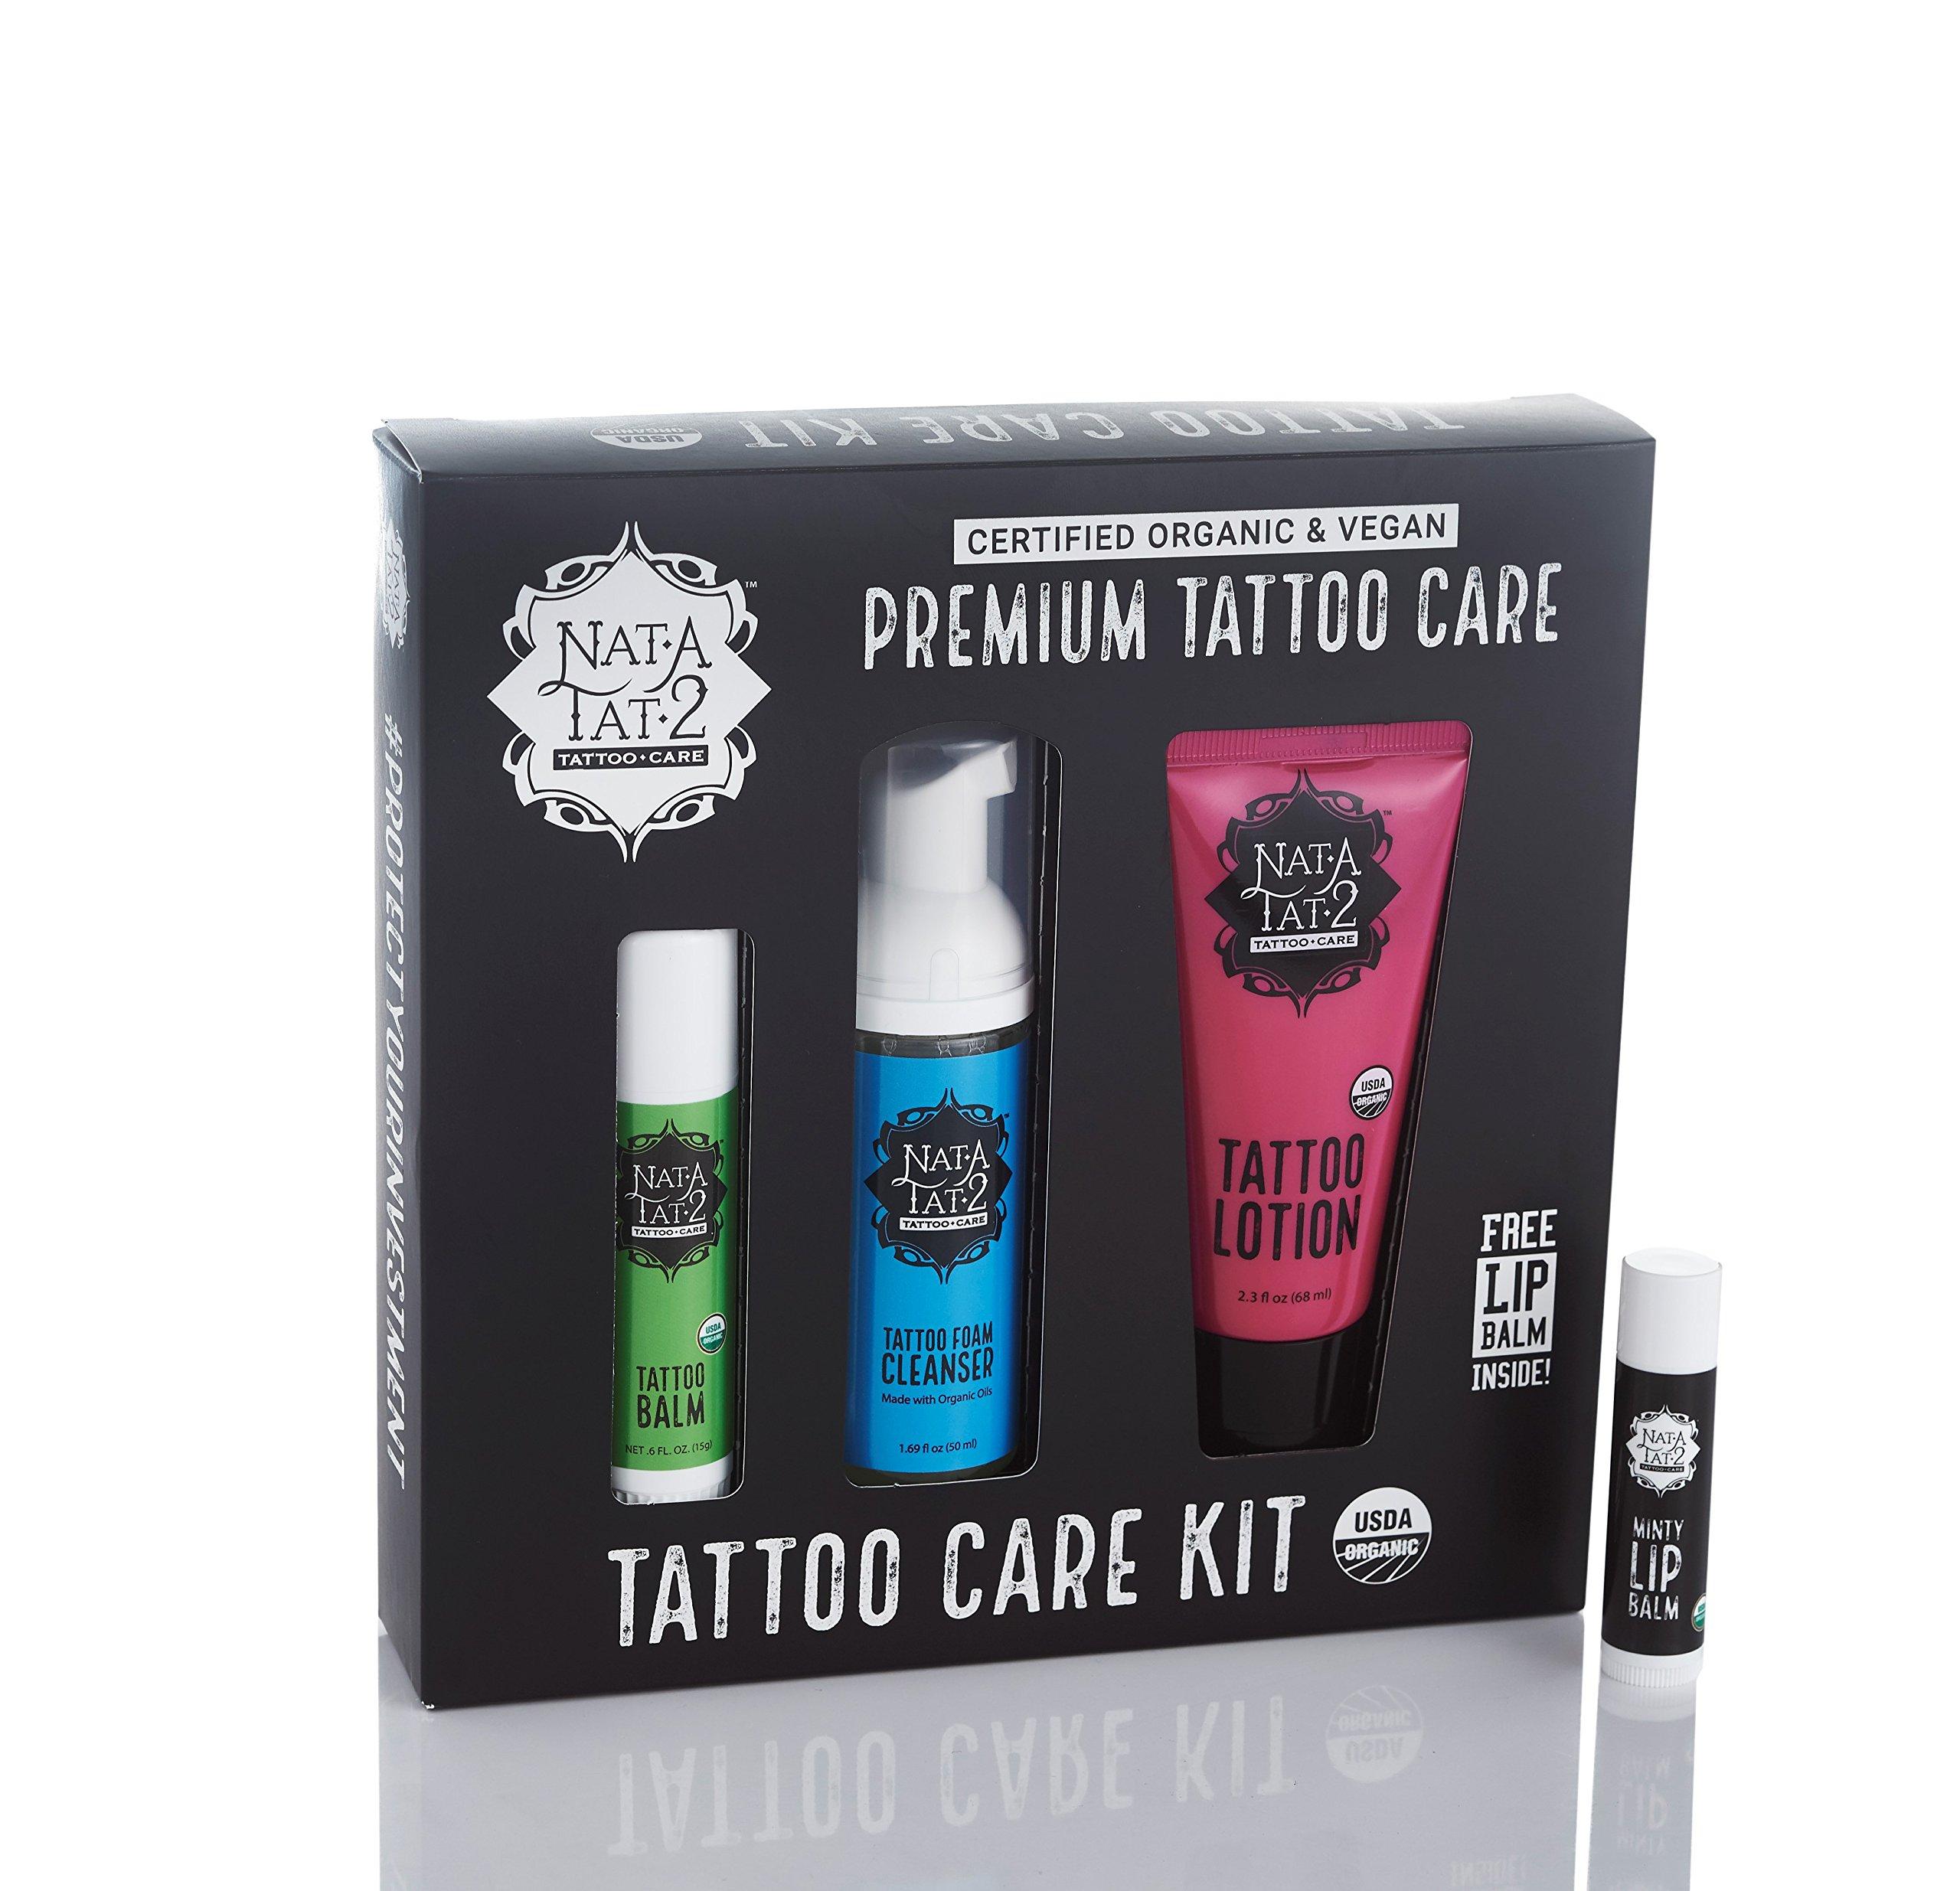 Nat-A-Tat2 Premium Vegan and Organic-Certified Tattoo Aftercare Kit for Optimal Tattoo Healing (4-Piece)